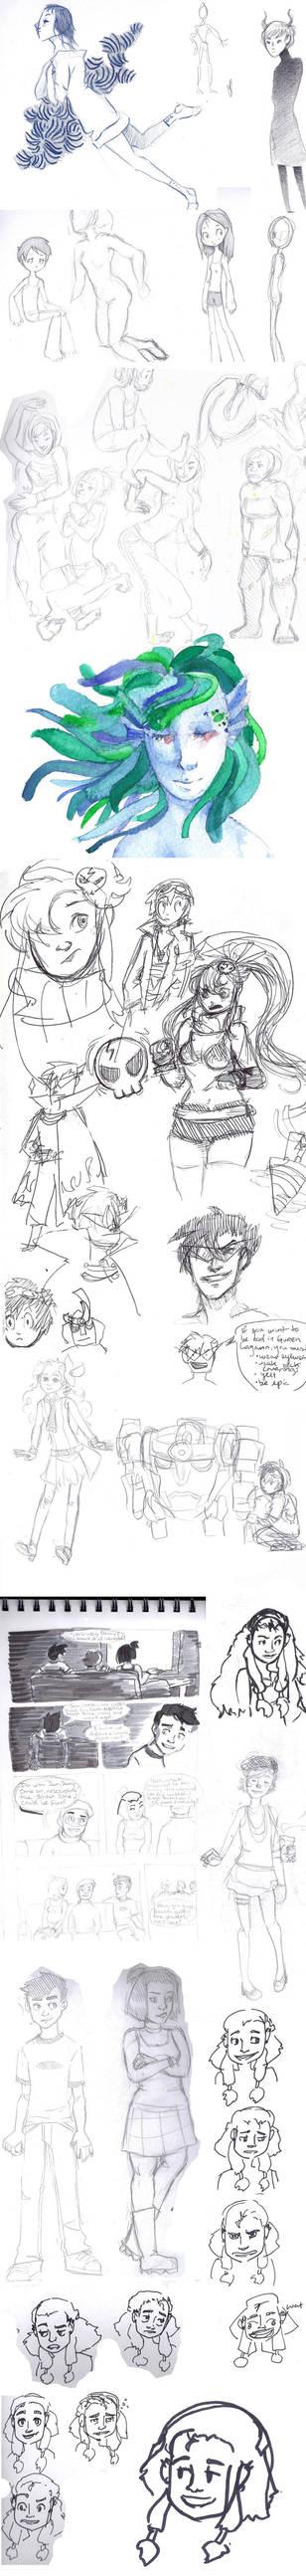 Sketchdumpdd by Amandazon